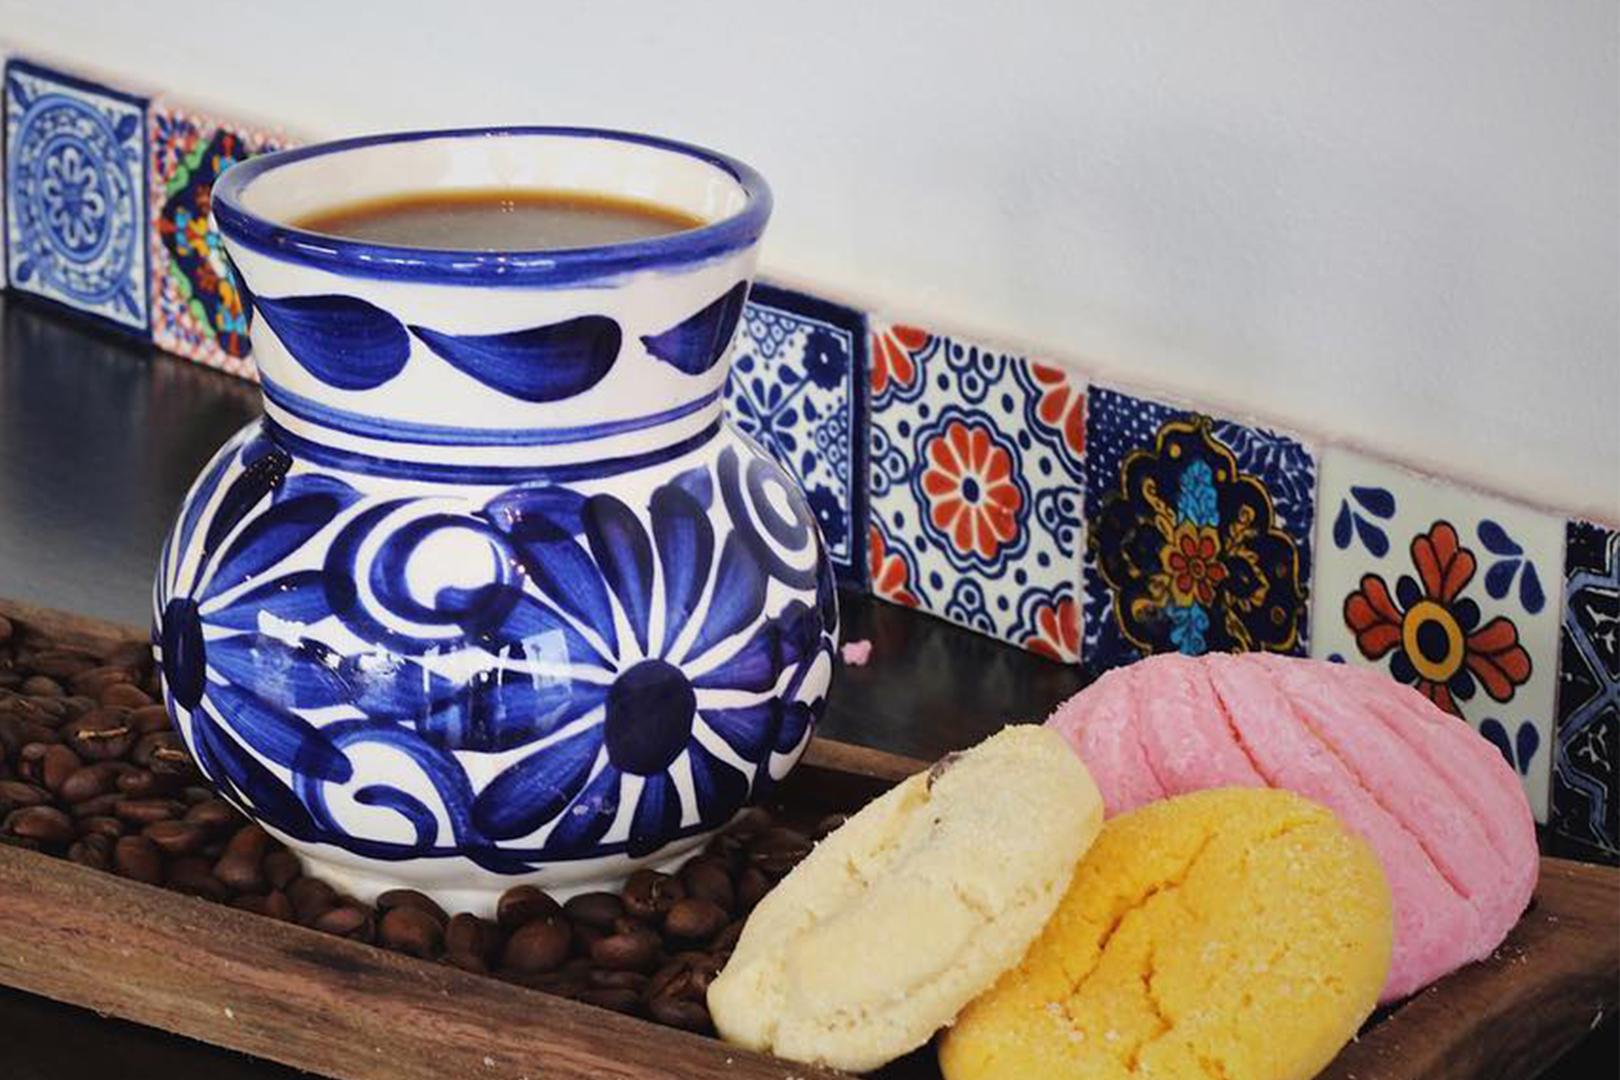 Mi Cafecito Cafe De Olla